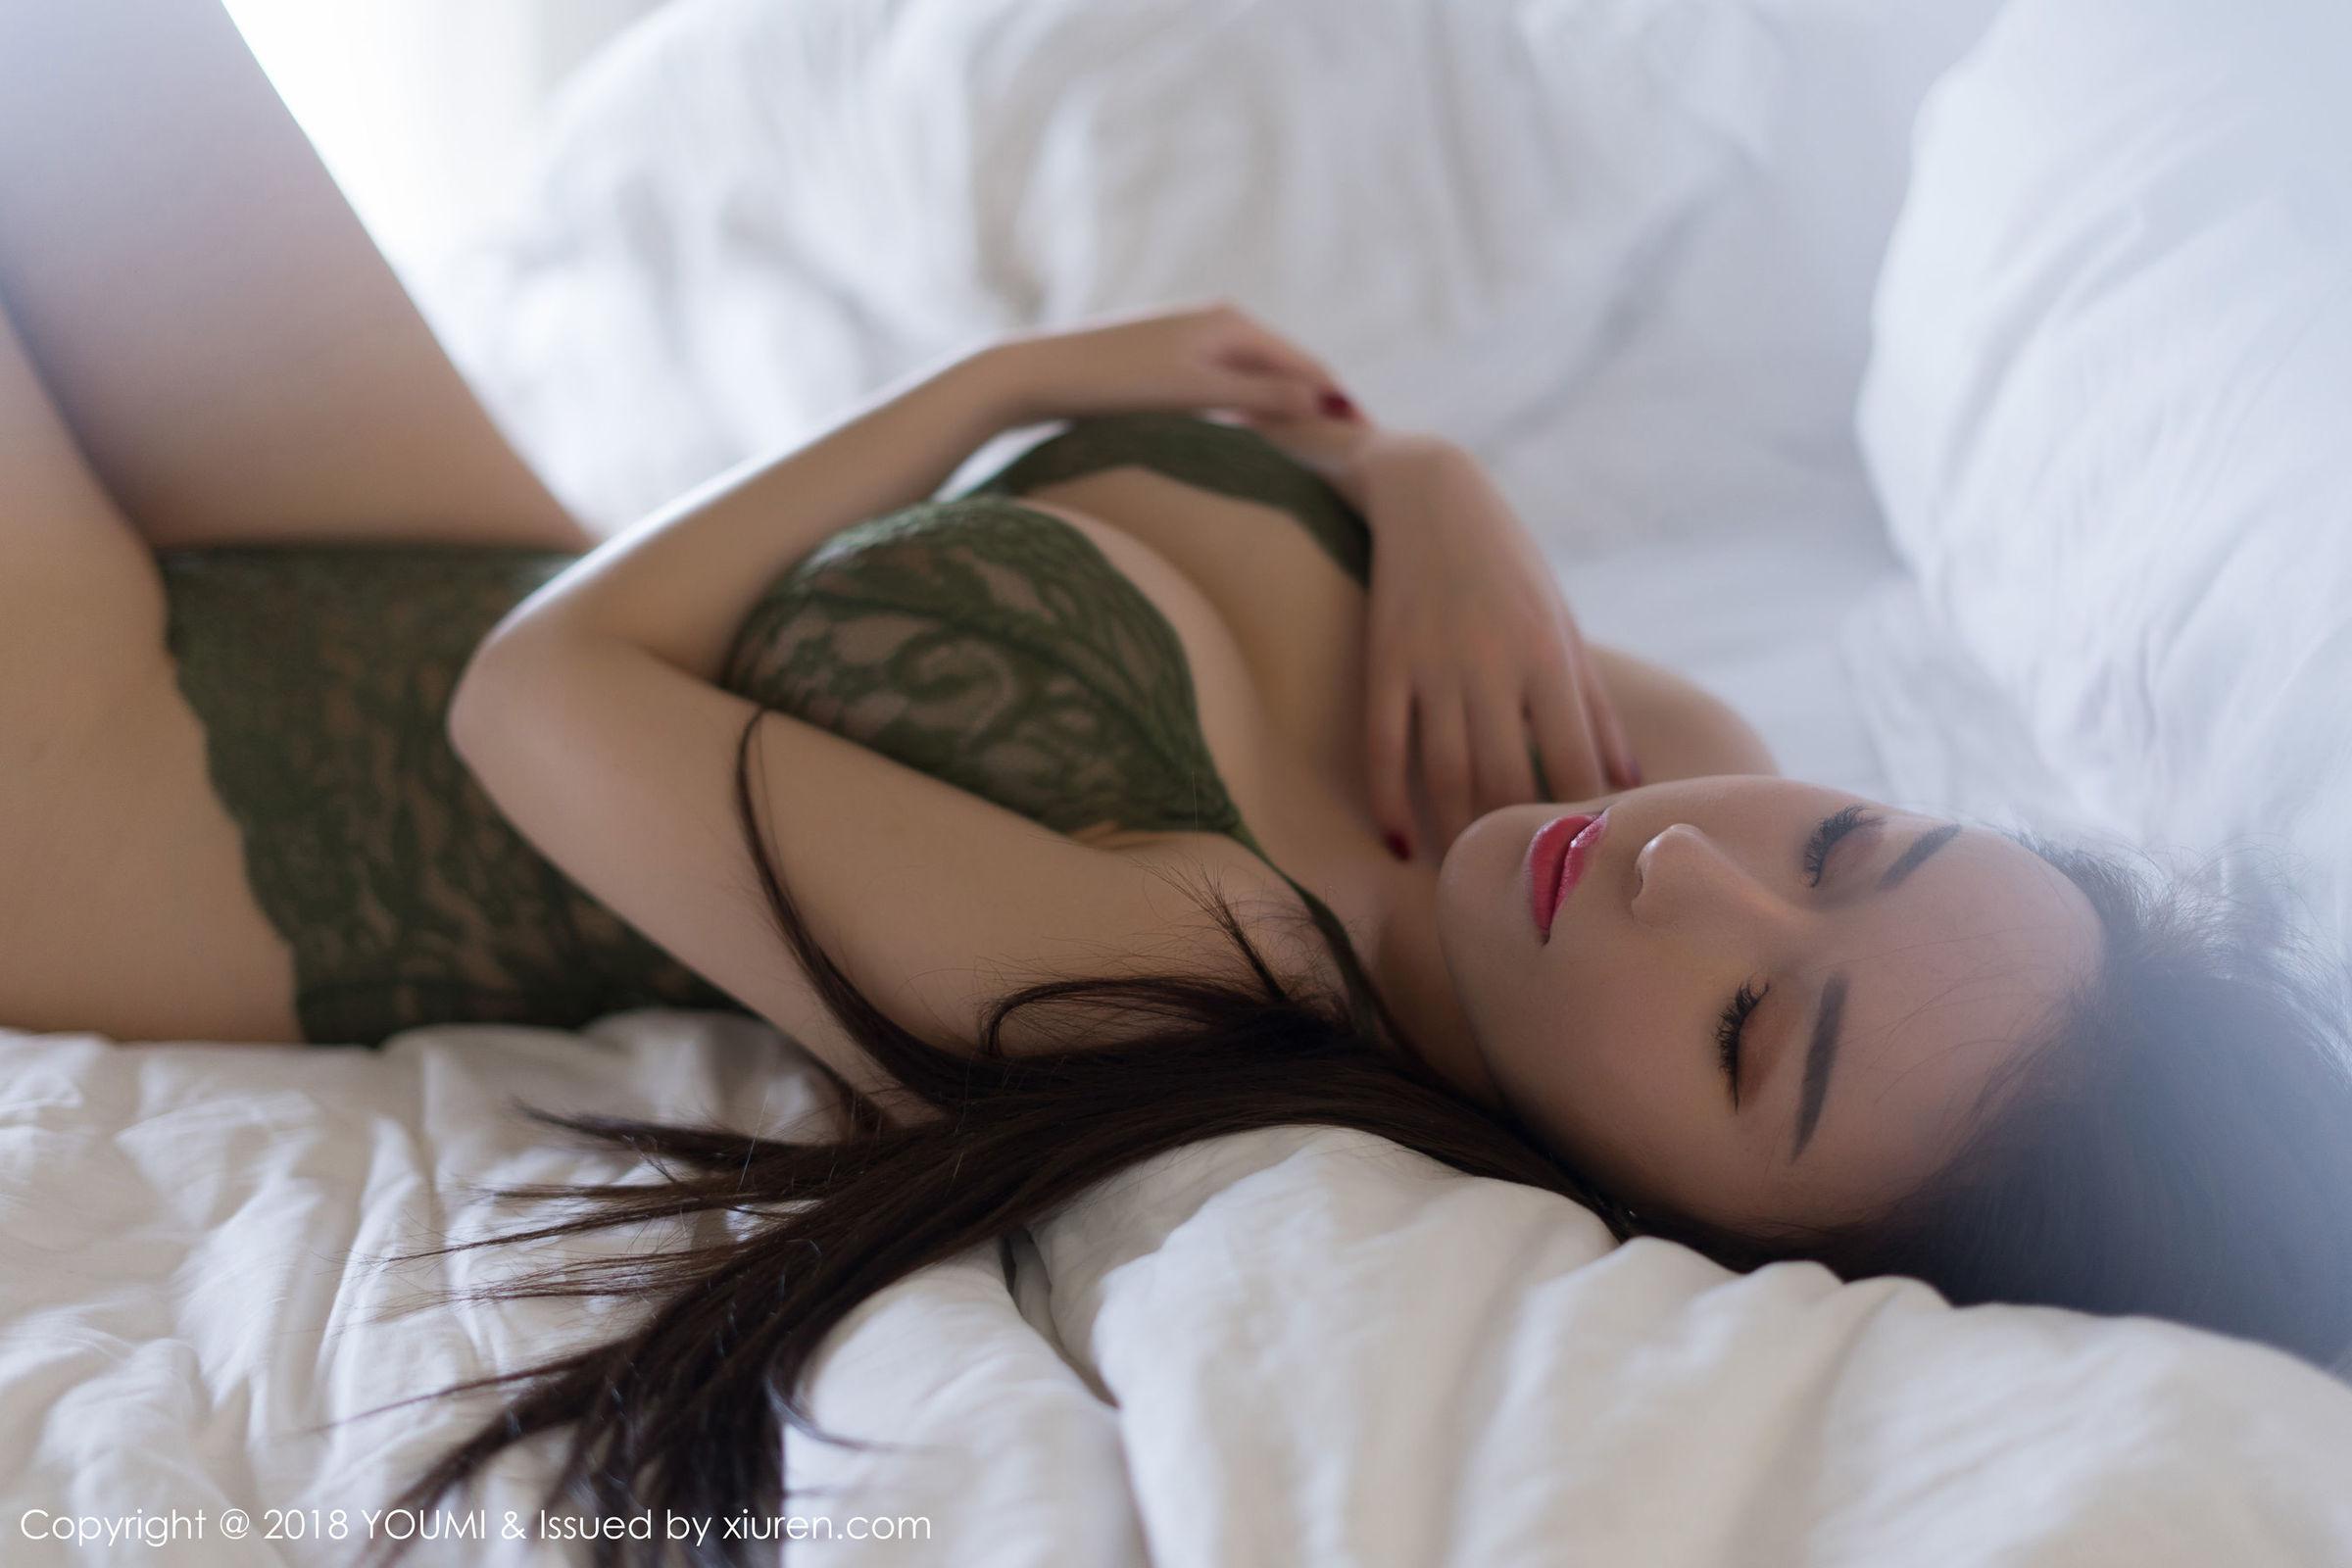 [YouMi尤蜜荟] Vol.228 性感女神@Egg_尤妮丝马尔代夫旅拍写真